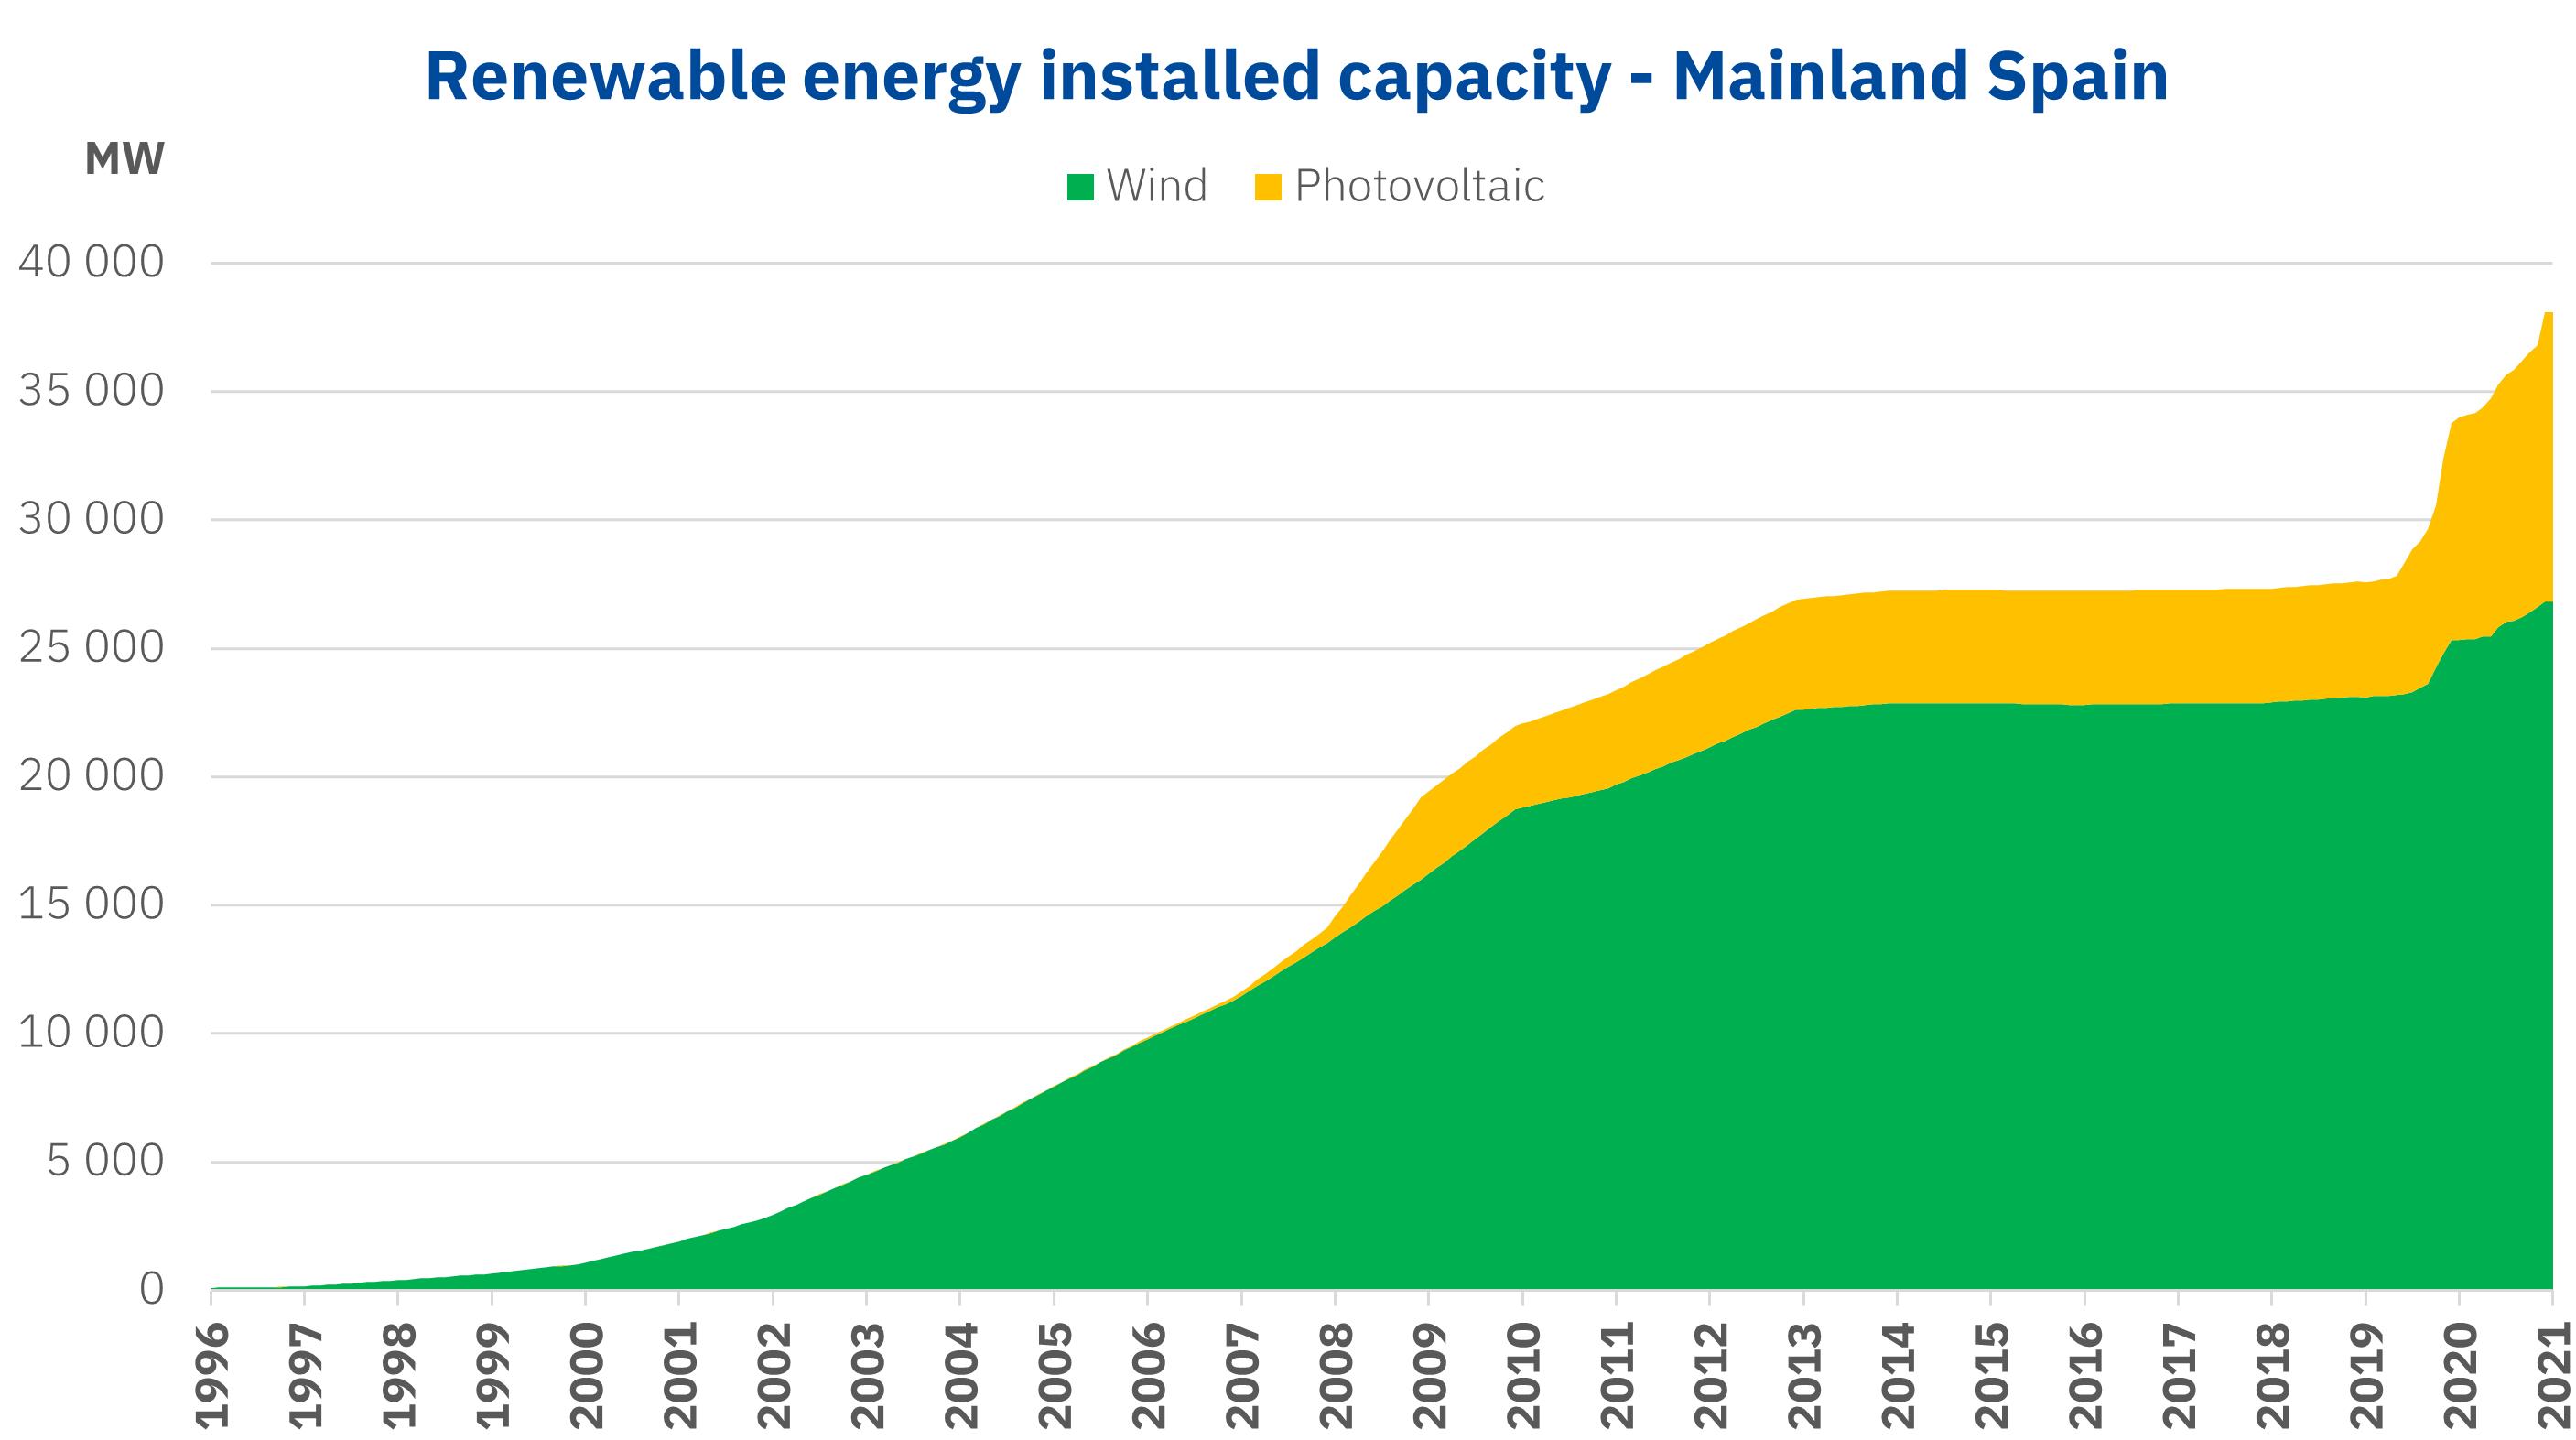 AleaSoft - Renewable energies installed capcity photovoltaic wind Spain